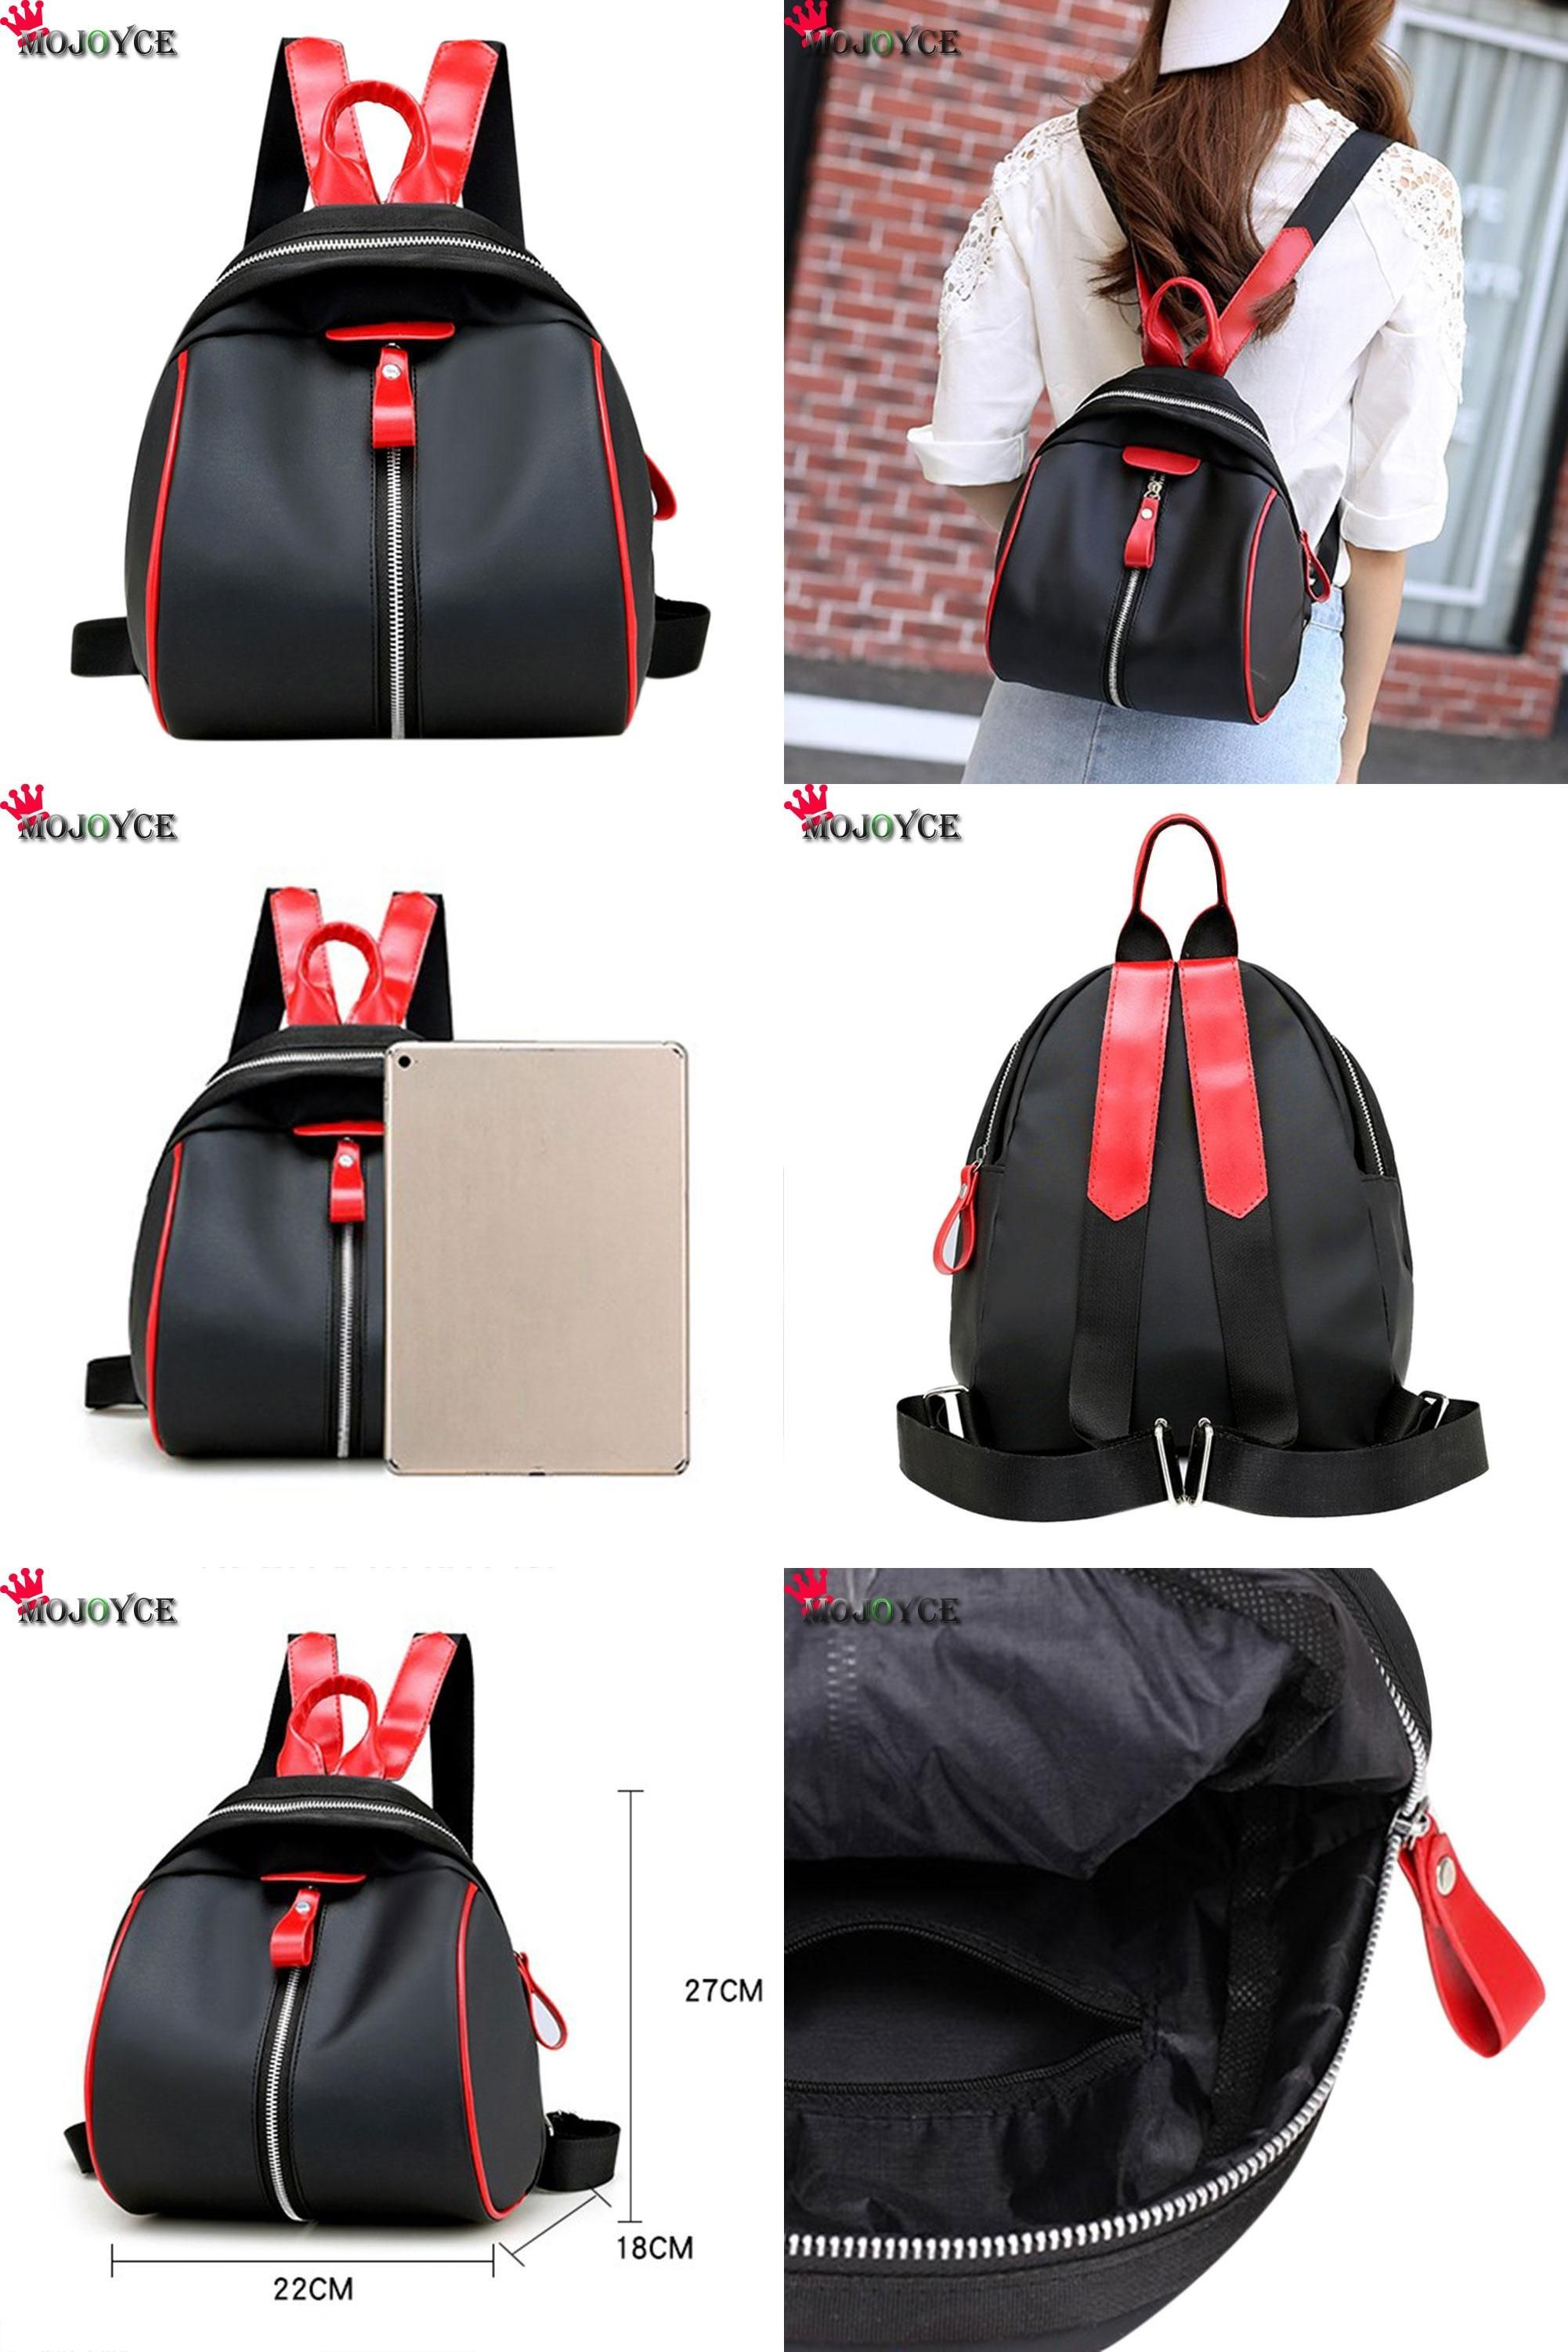 67616dc4eb  Visit to Buy  Small Waterproof Nylon Women Backpack Fashion Black Shoulder  Back Bag Preppy